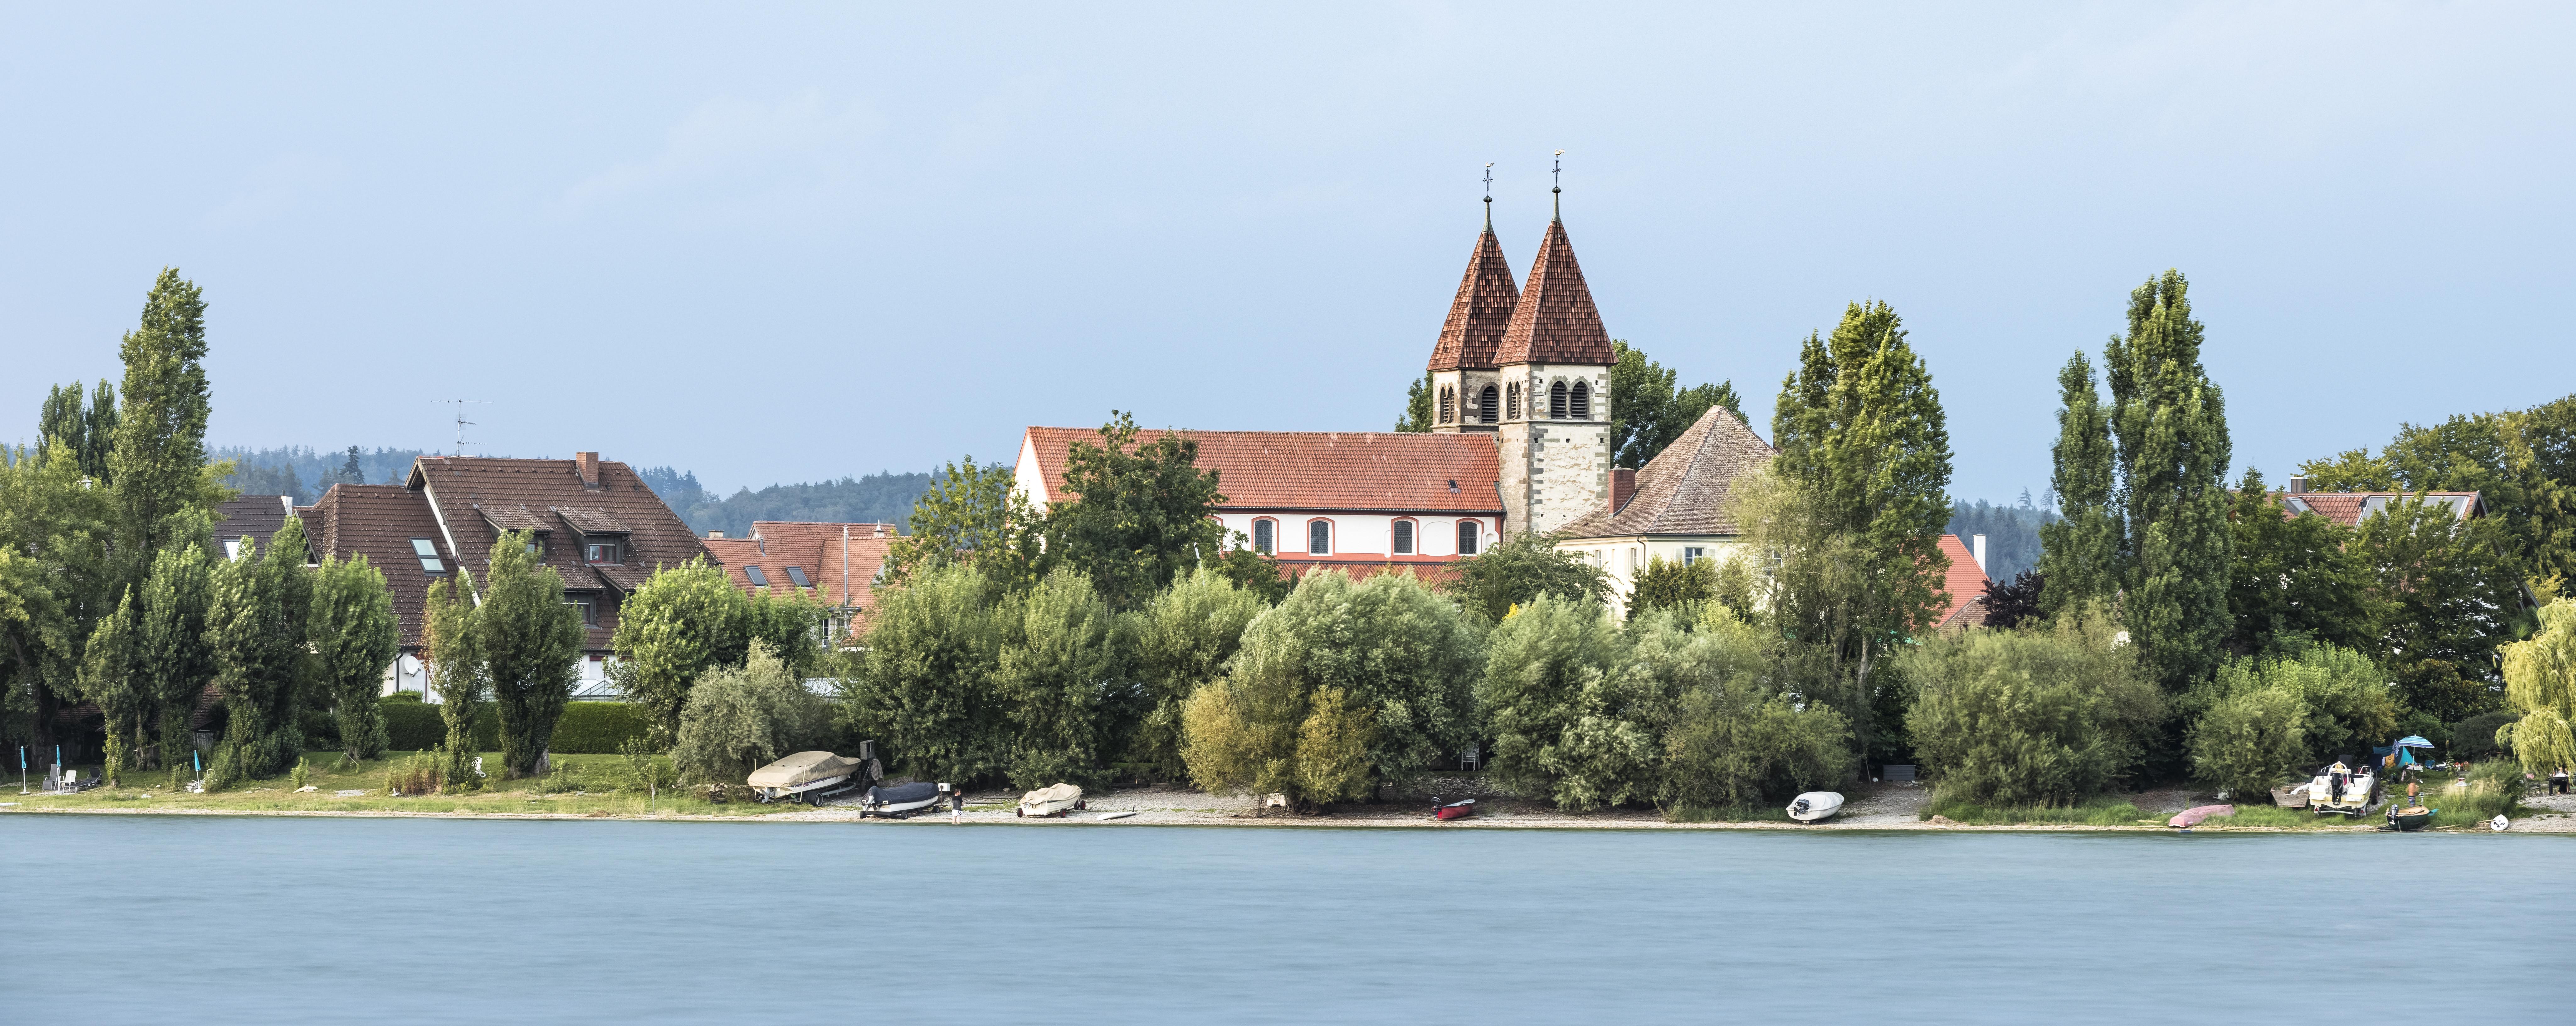 Insel Reichenau_St. Peter u. Paul_Foto Stefan Arendt